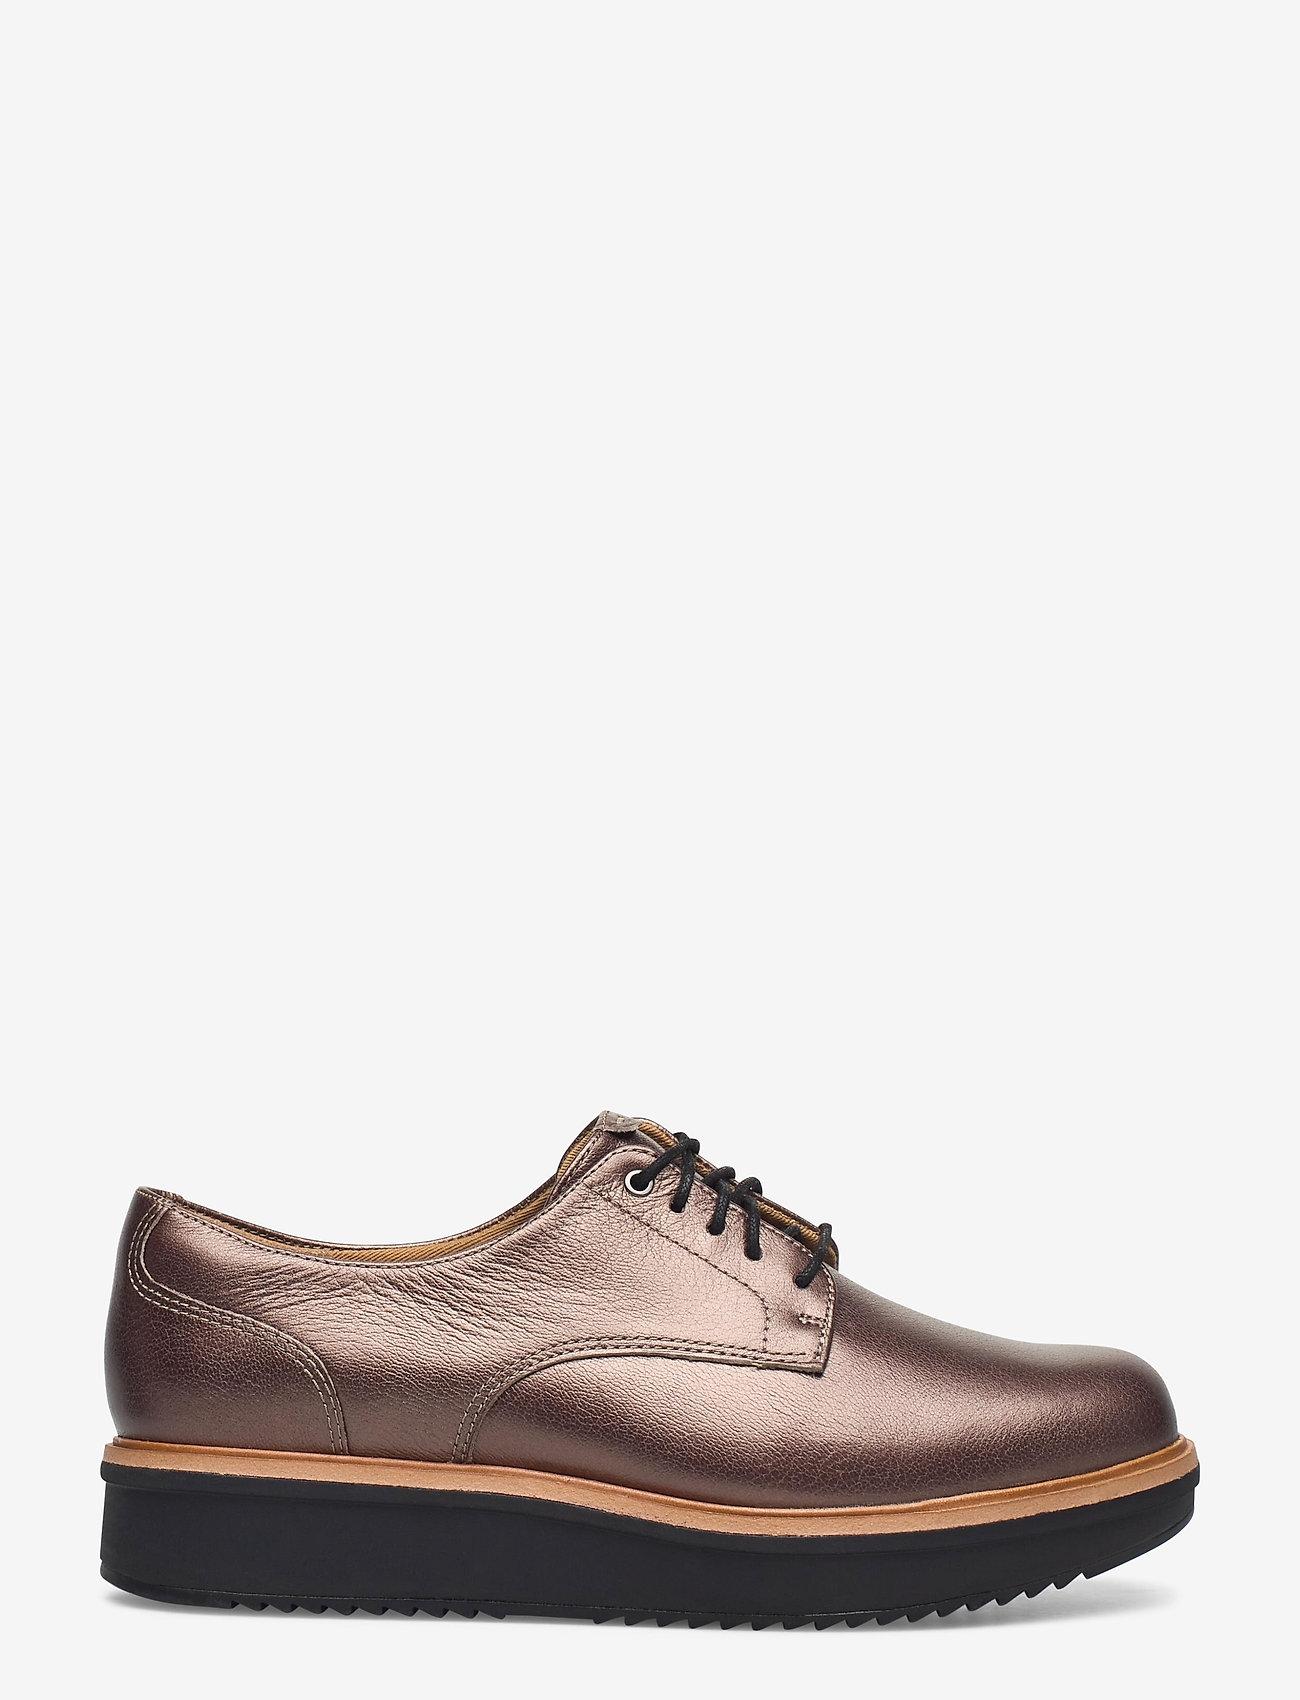 Clarks - Teadale Rhea - schnürschuhe - pewter leather - 1